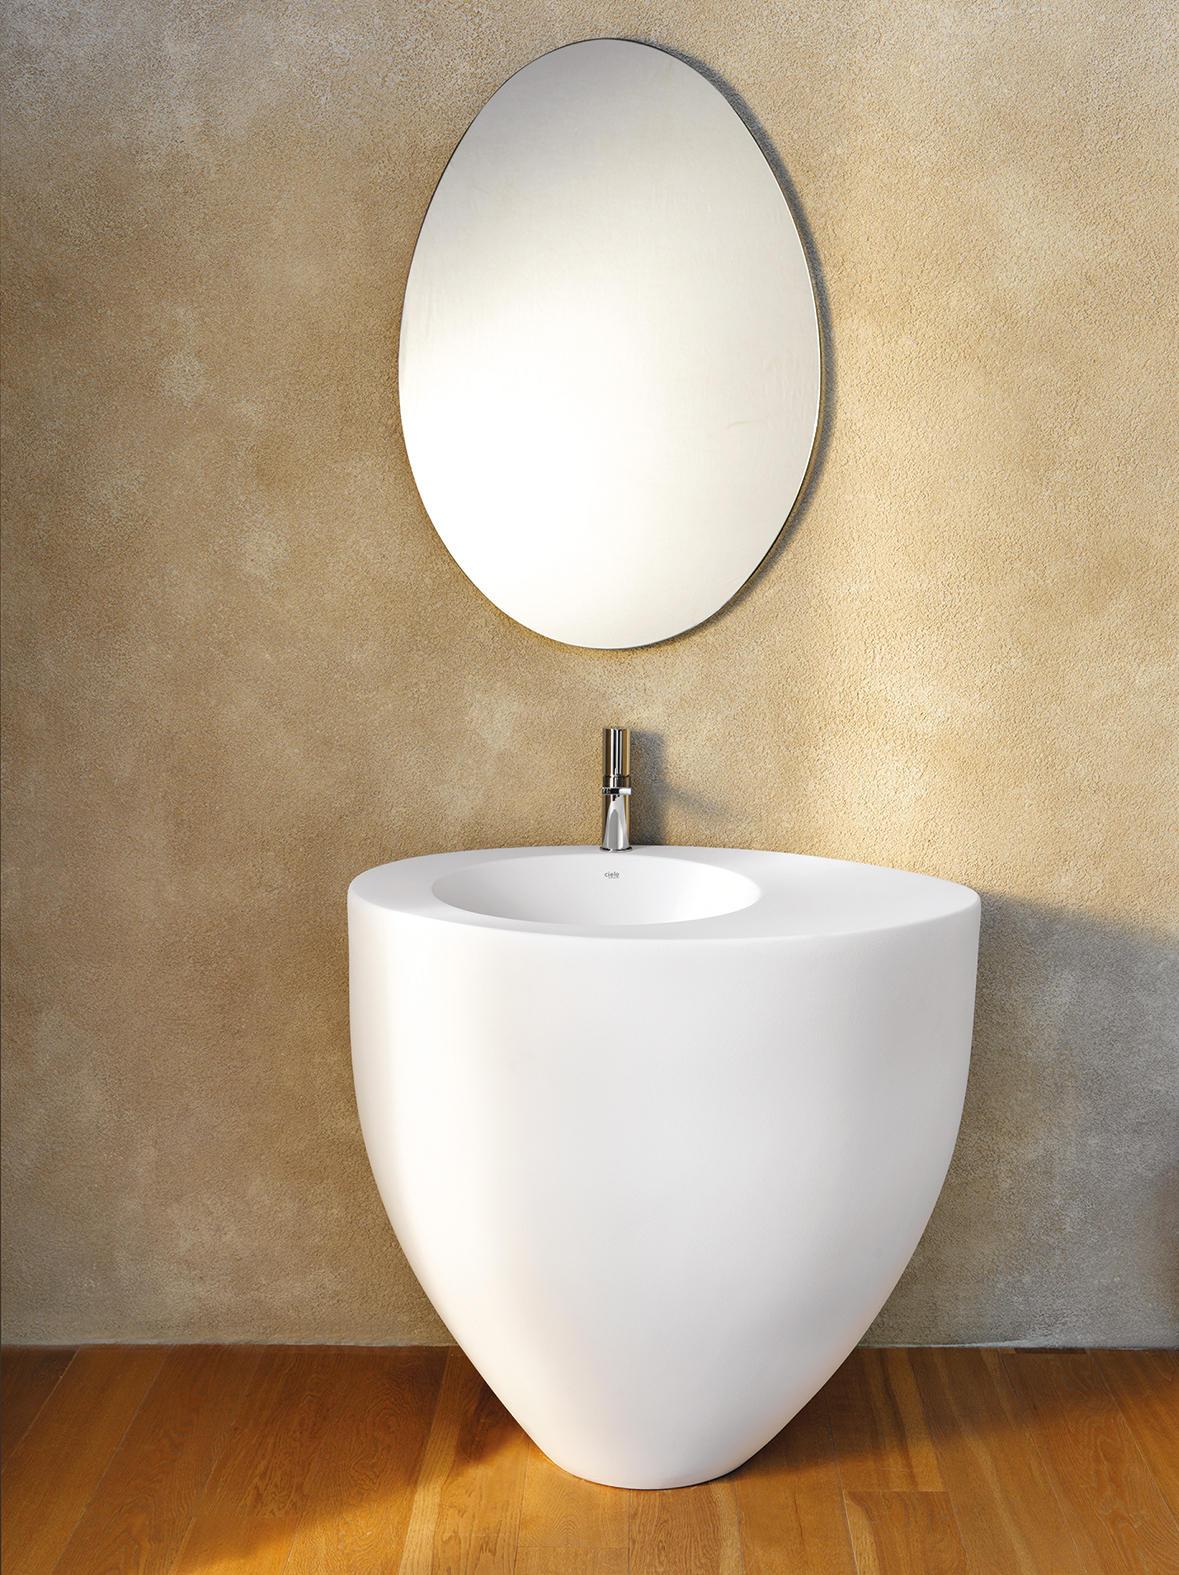 Sanitari Ceramica Cielo Prezzi.Le Giare Lavabo Freestanding Lavabi Ceramica Cielo Architonic